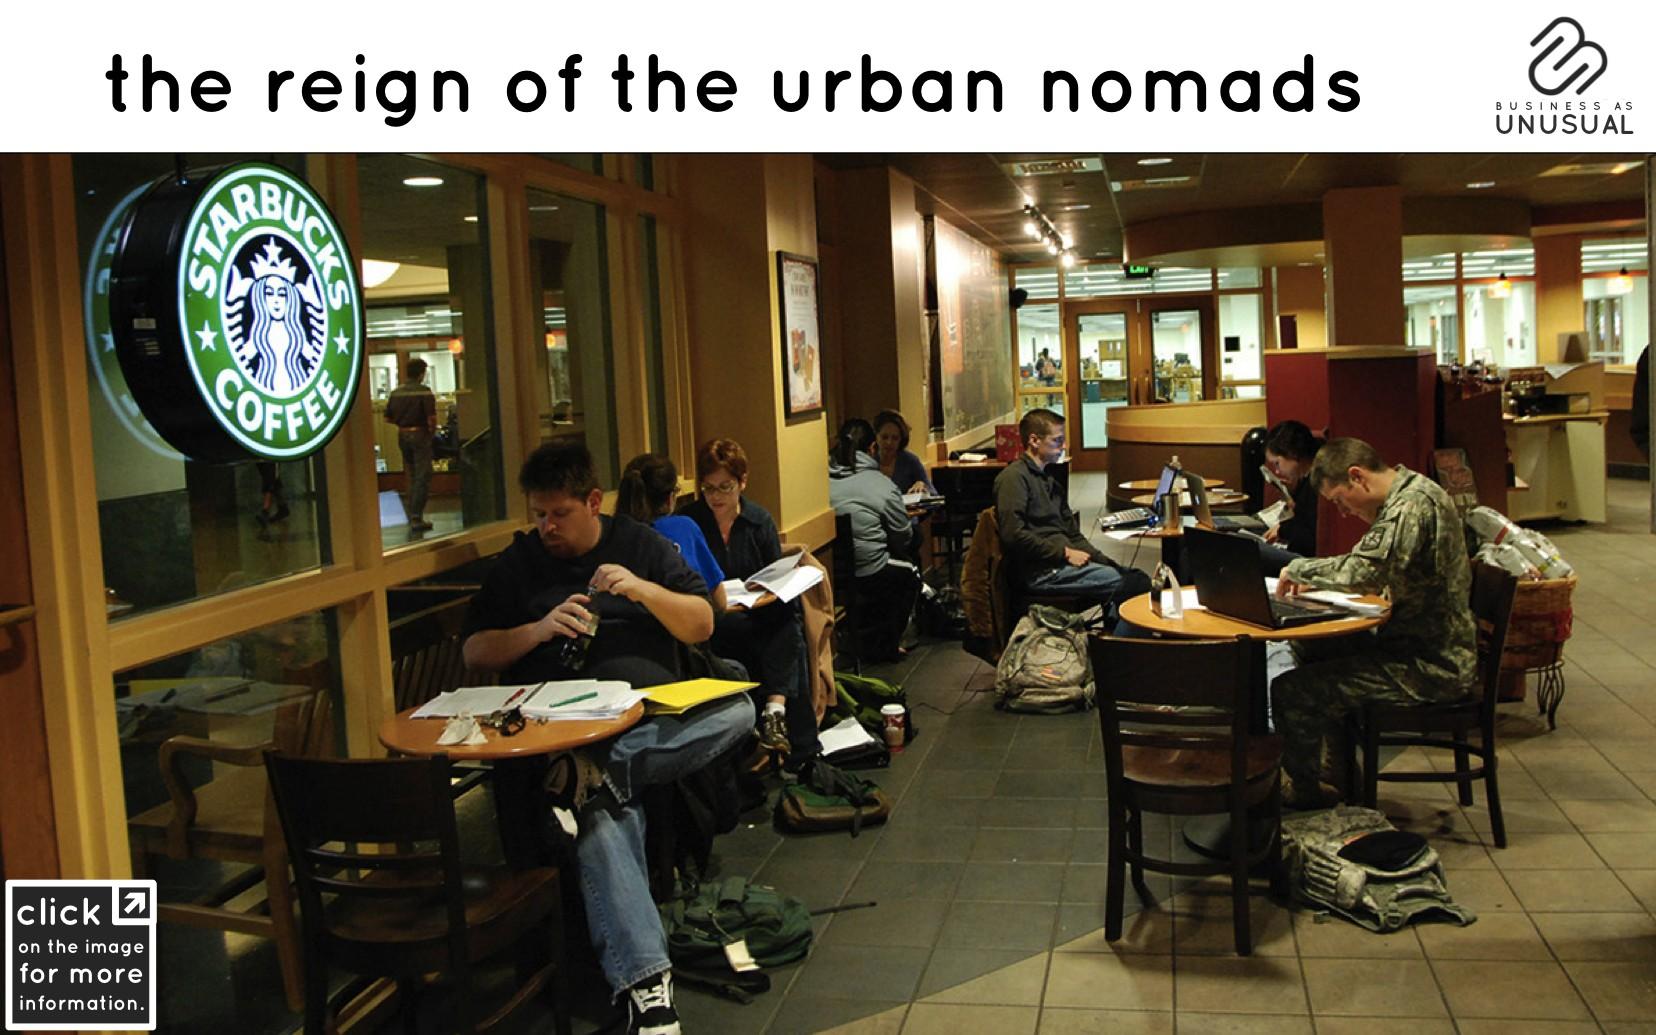 the reign of the urban nomads - strabucks